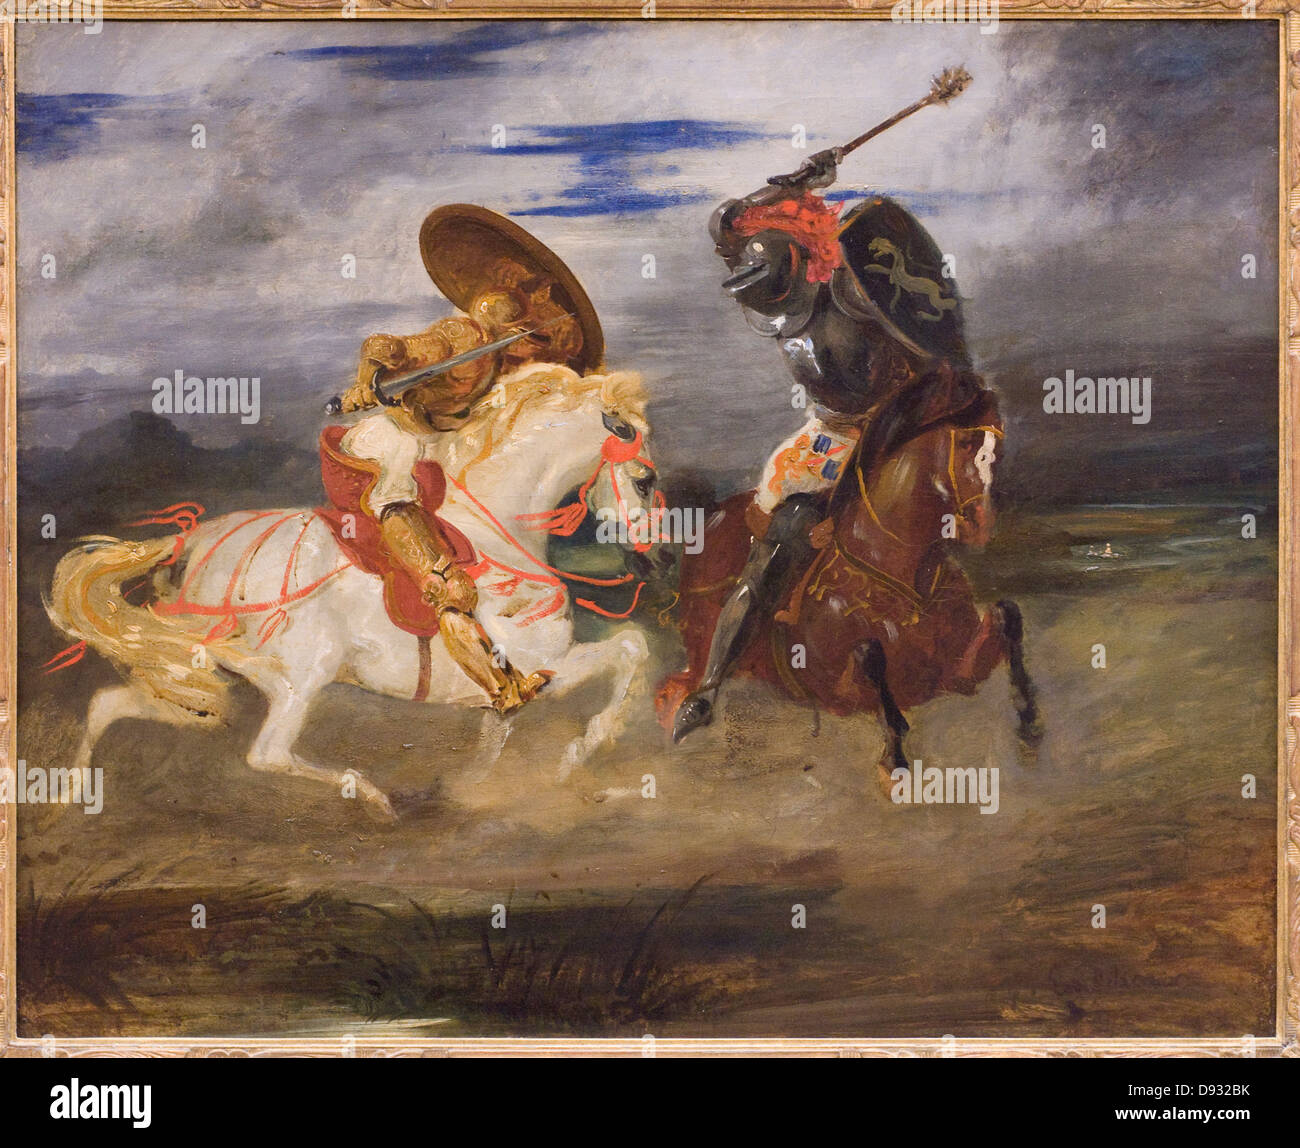 Eugène Delacroix Combat de chevaliers dans la campagne - Battle of Knights in the countryside 1824 XIX th century - Stock Image